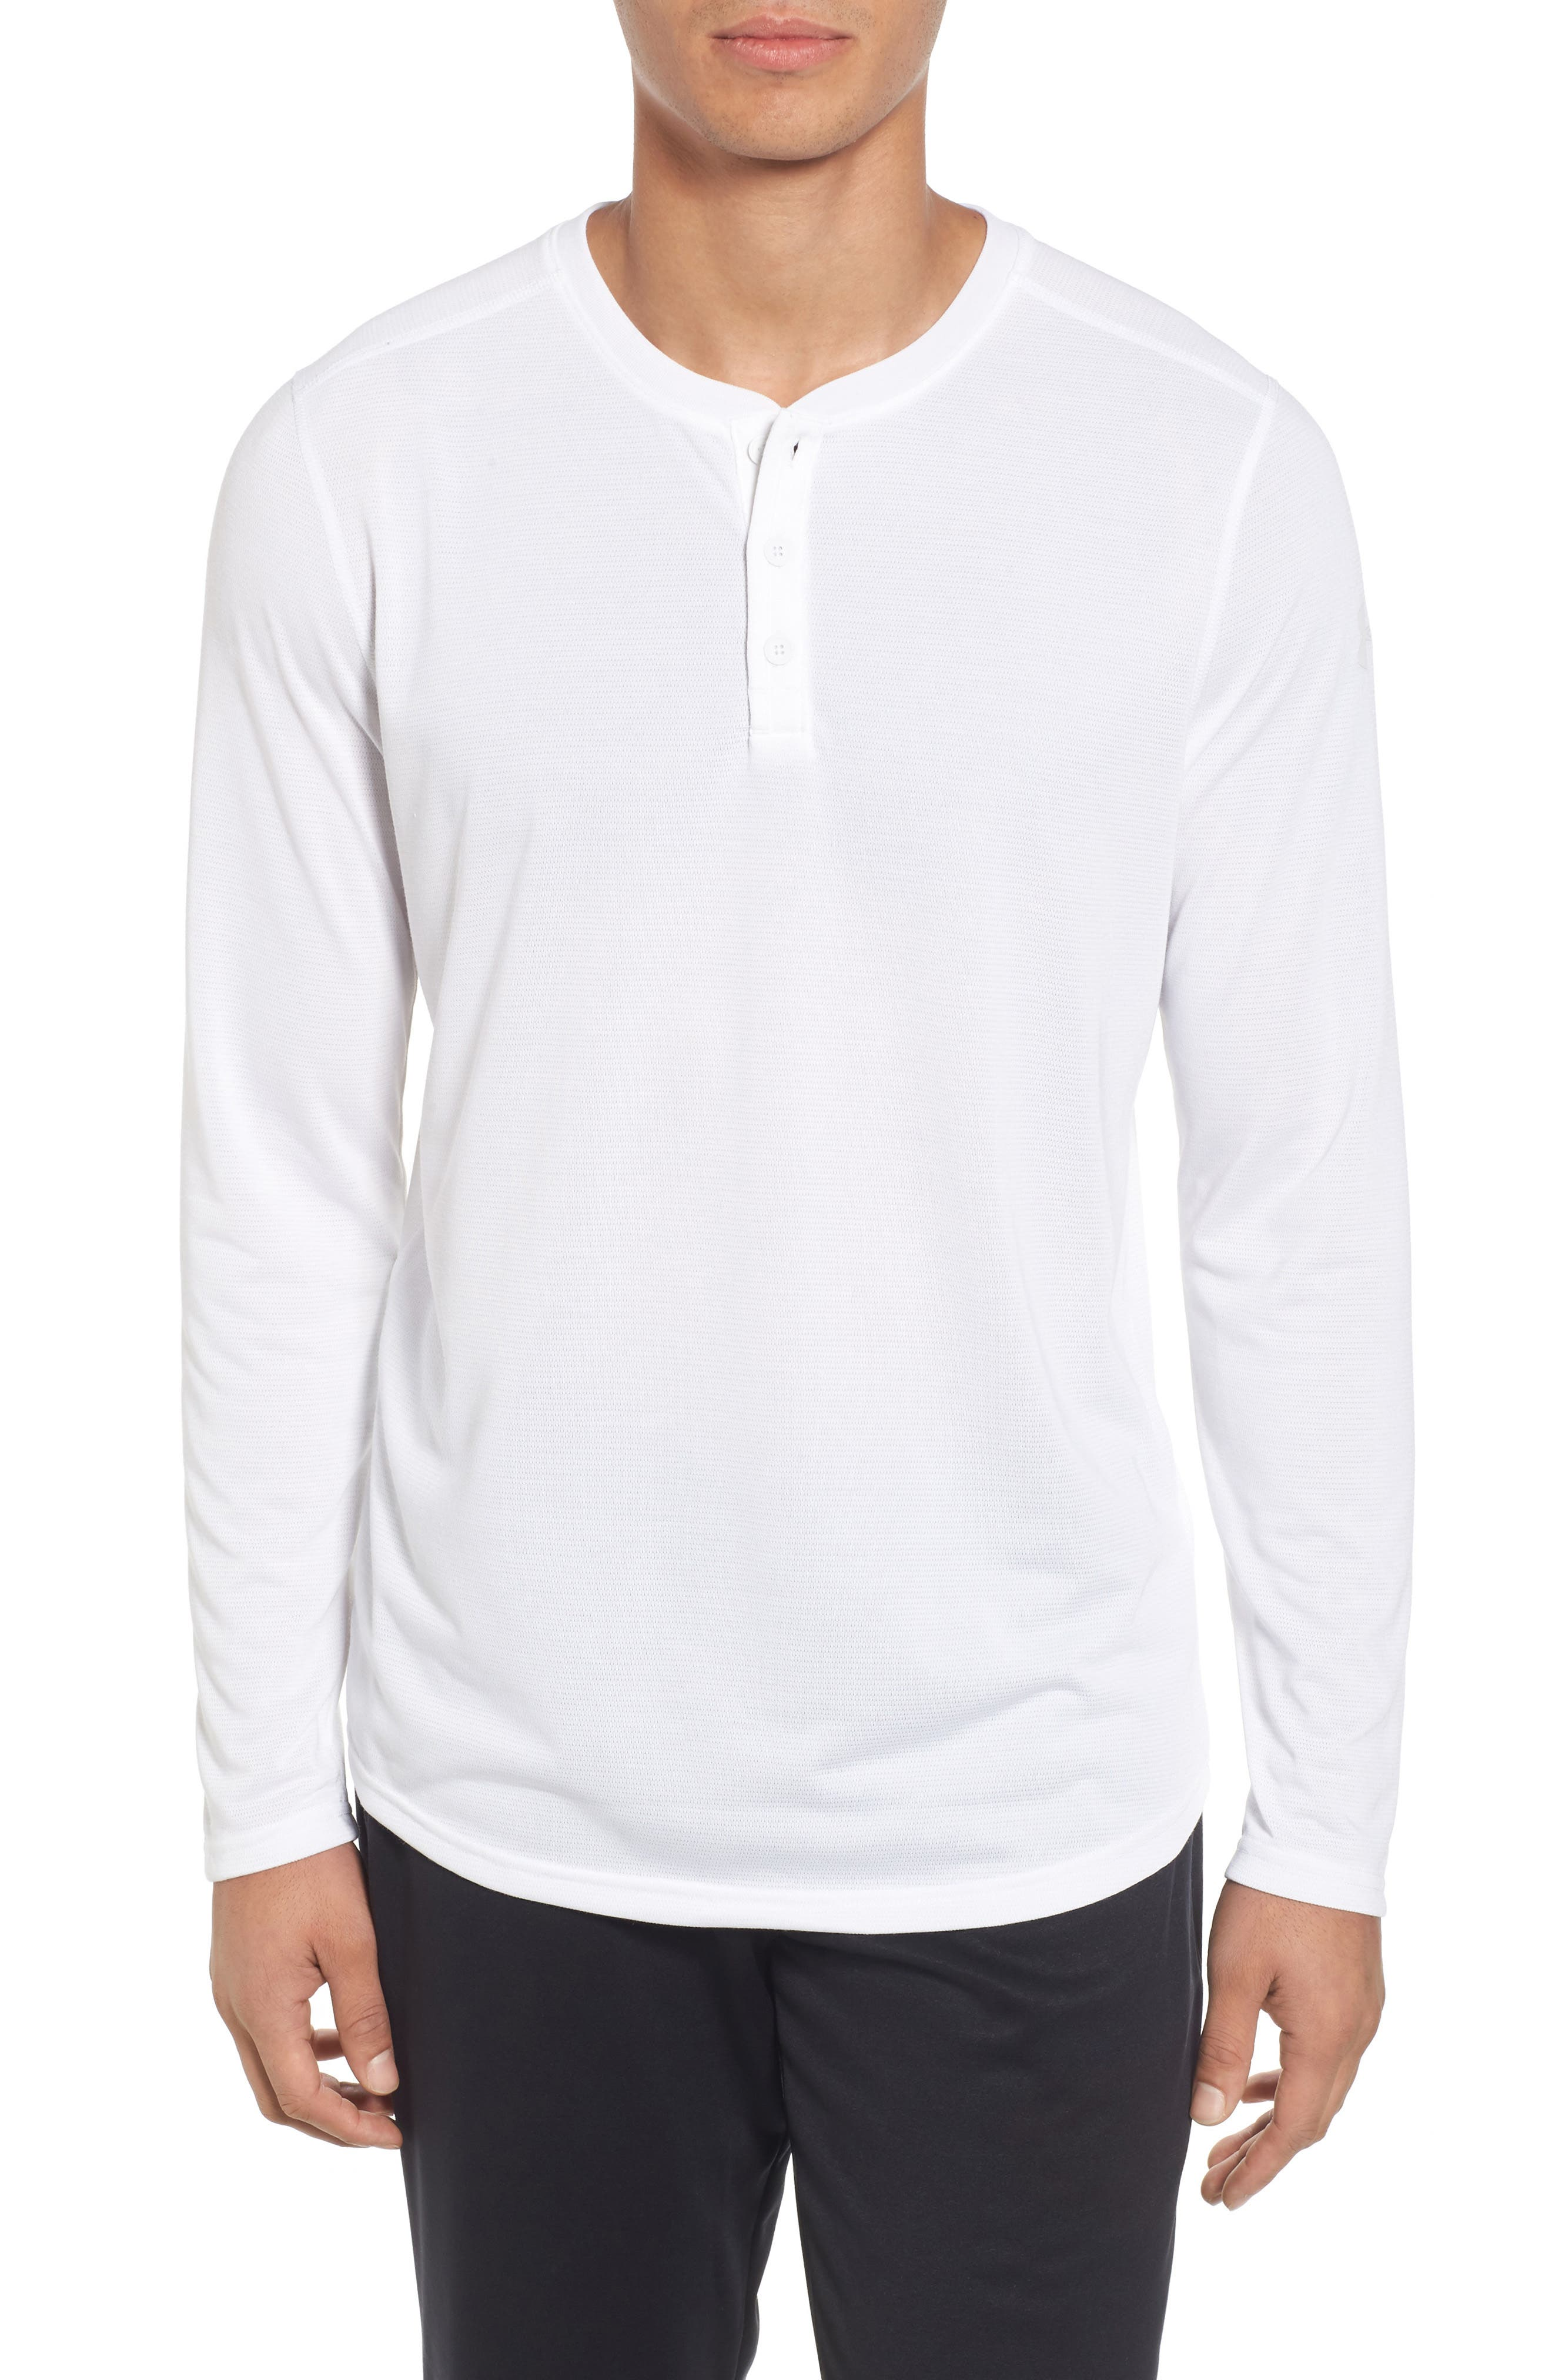 Threadborne<sup>™</sup> Long Sleeve Henley,                         Main,                         color, White / White